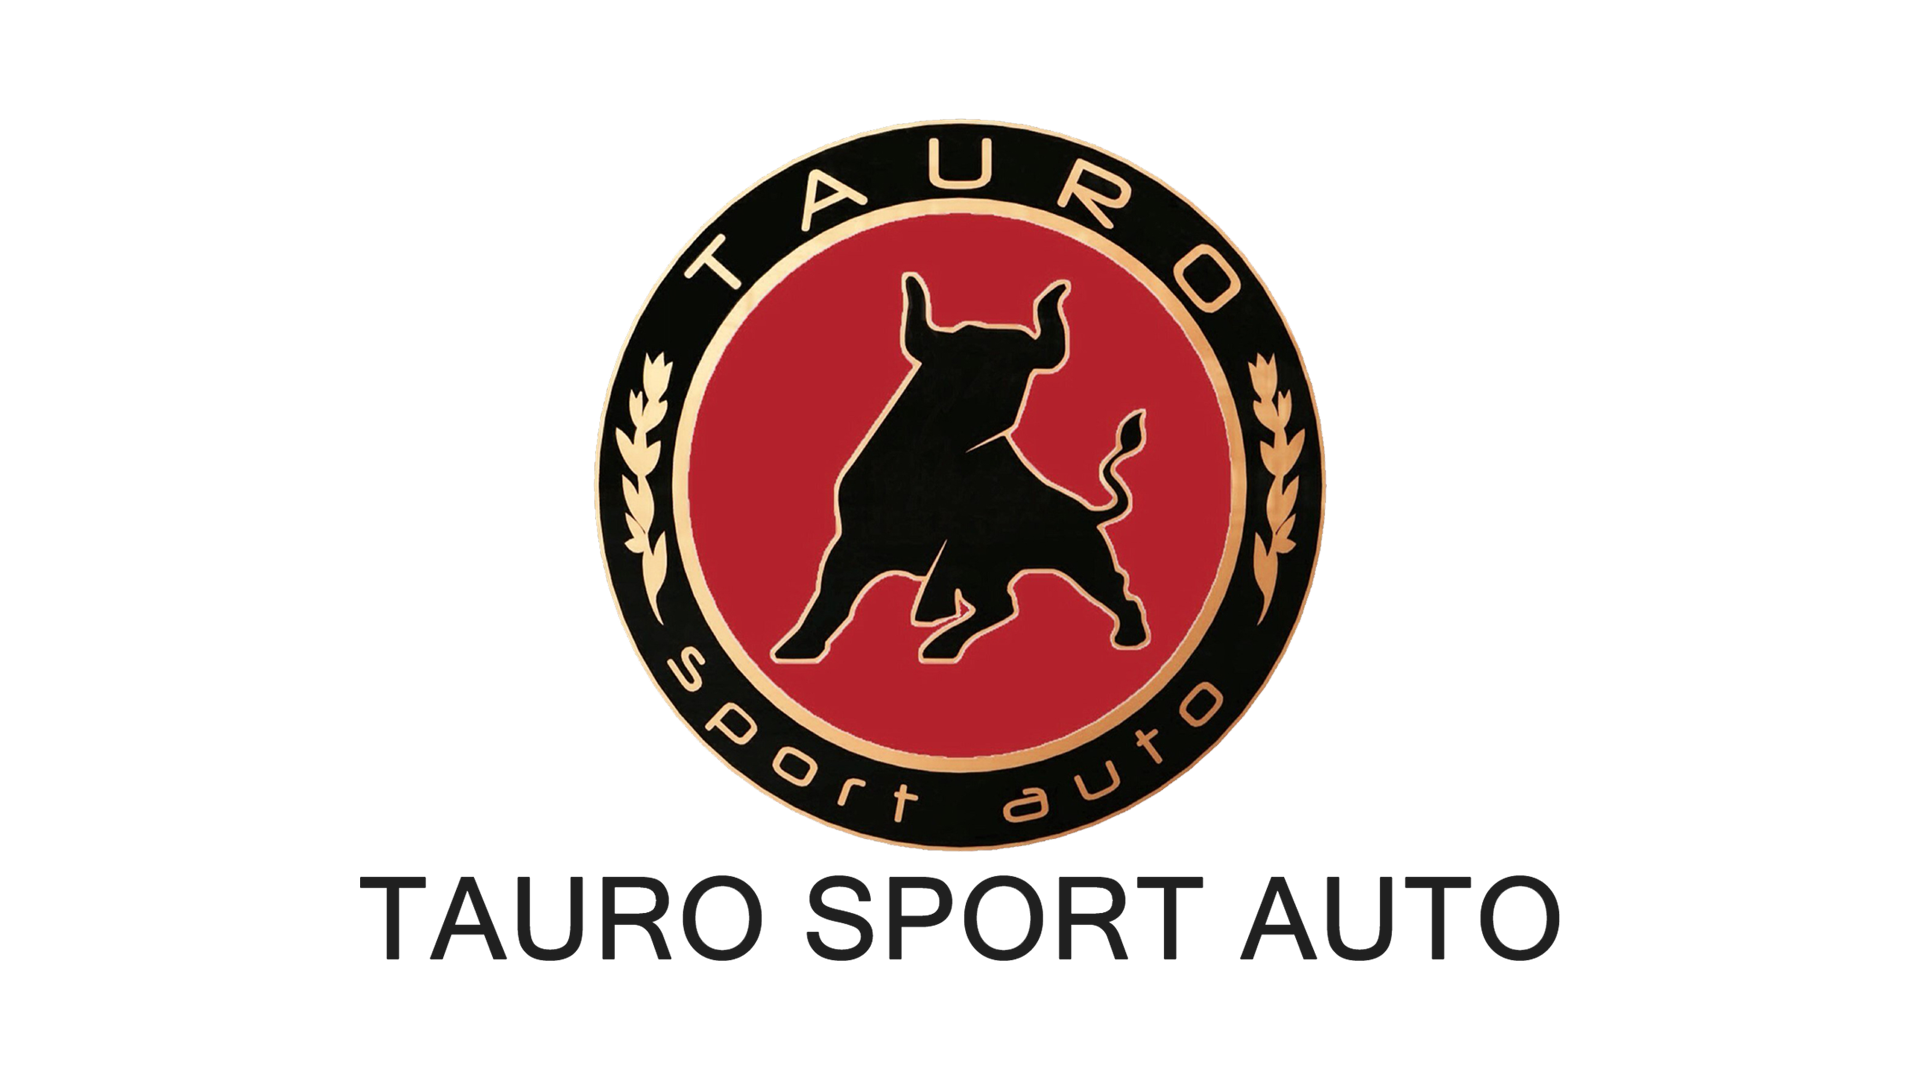 Tauro Sport Auto Logo Hd Png Information Carlogos Org